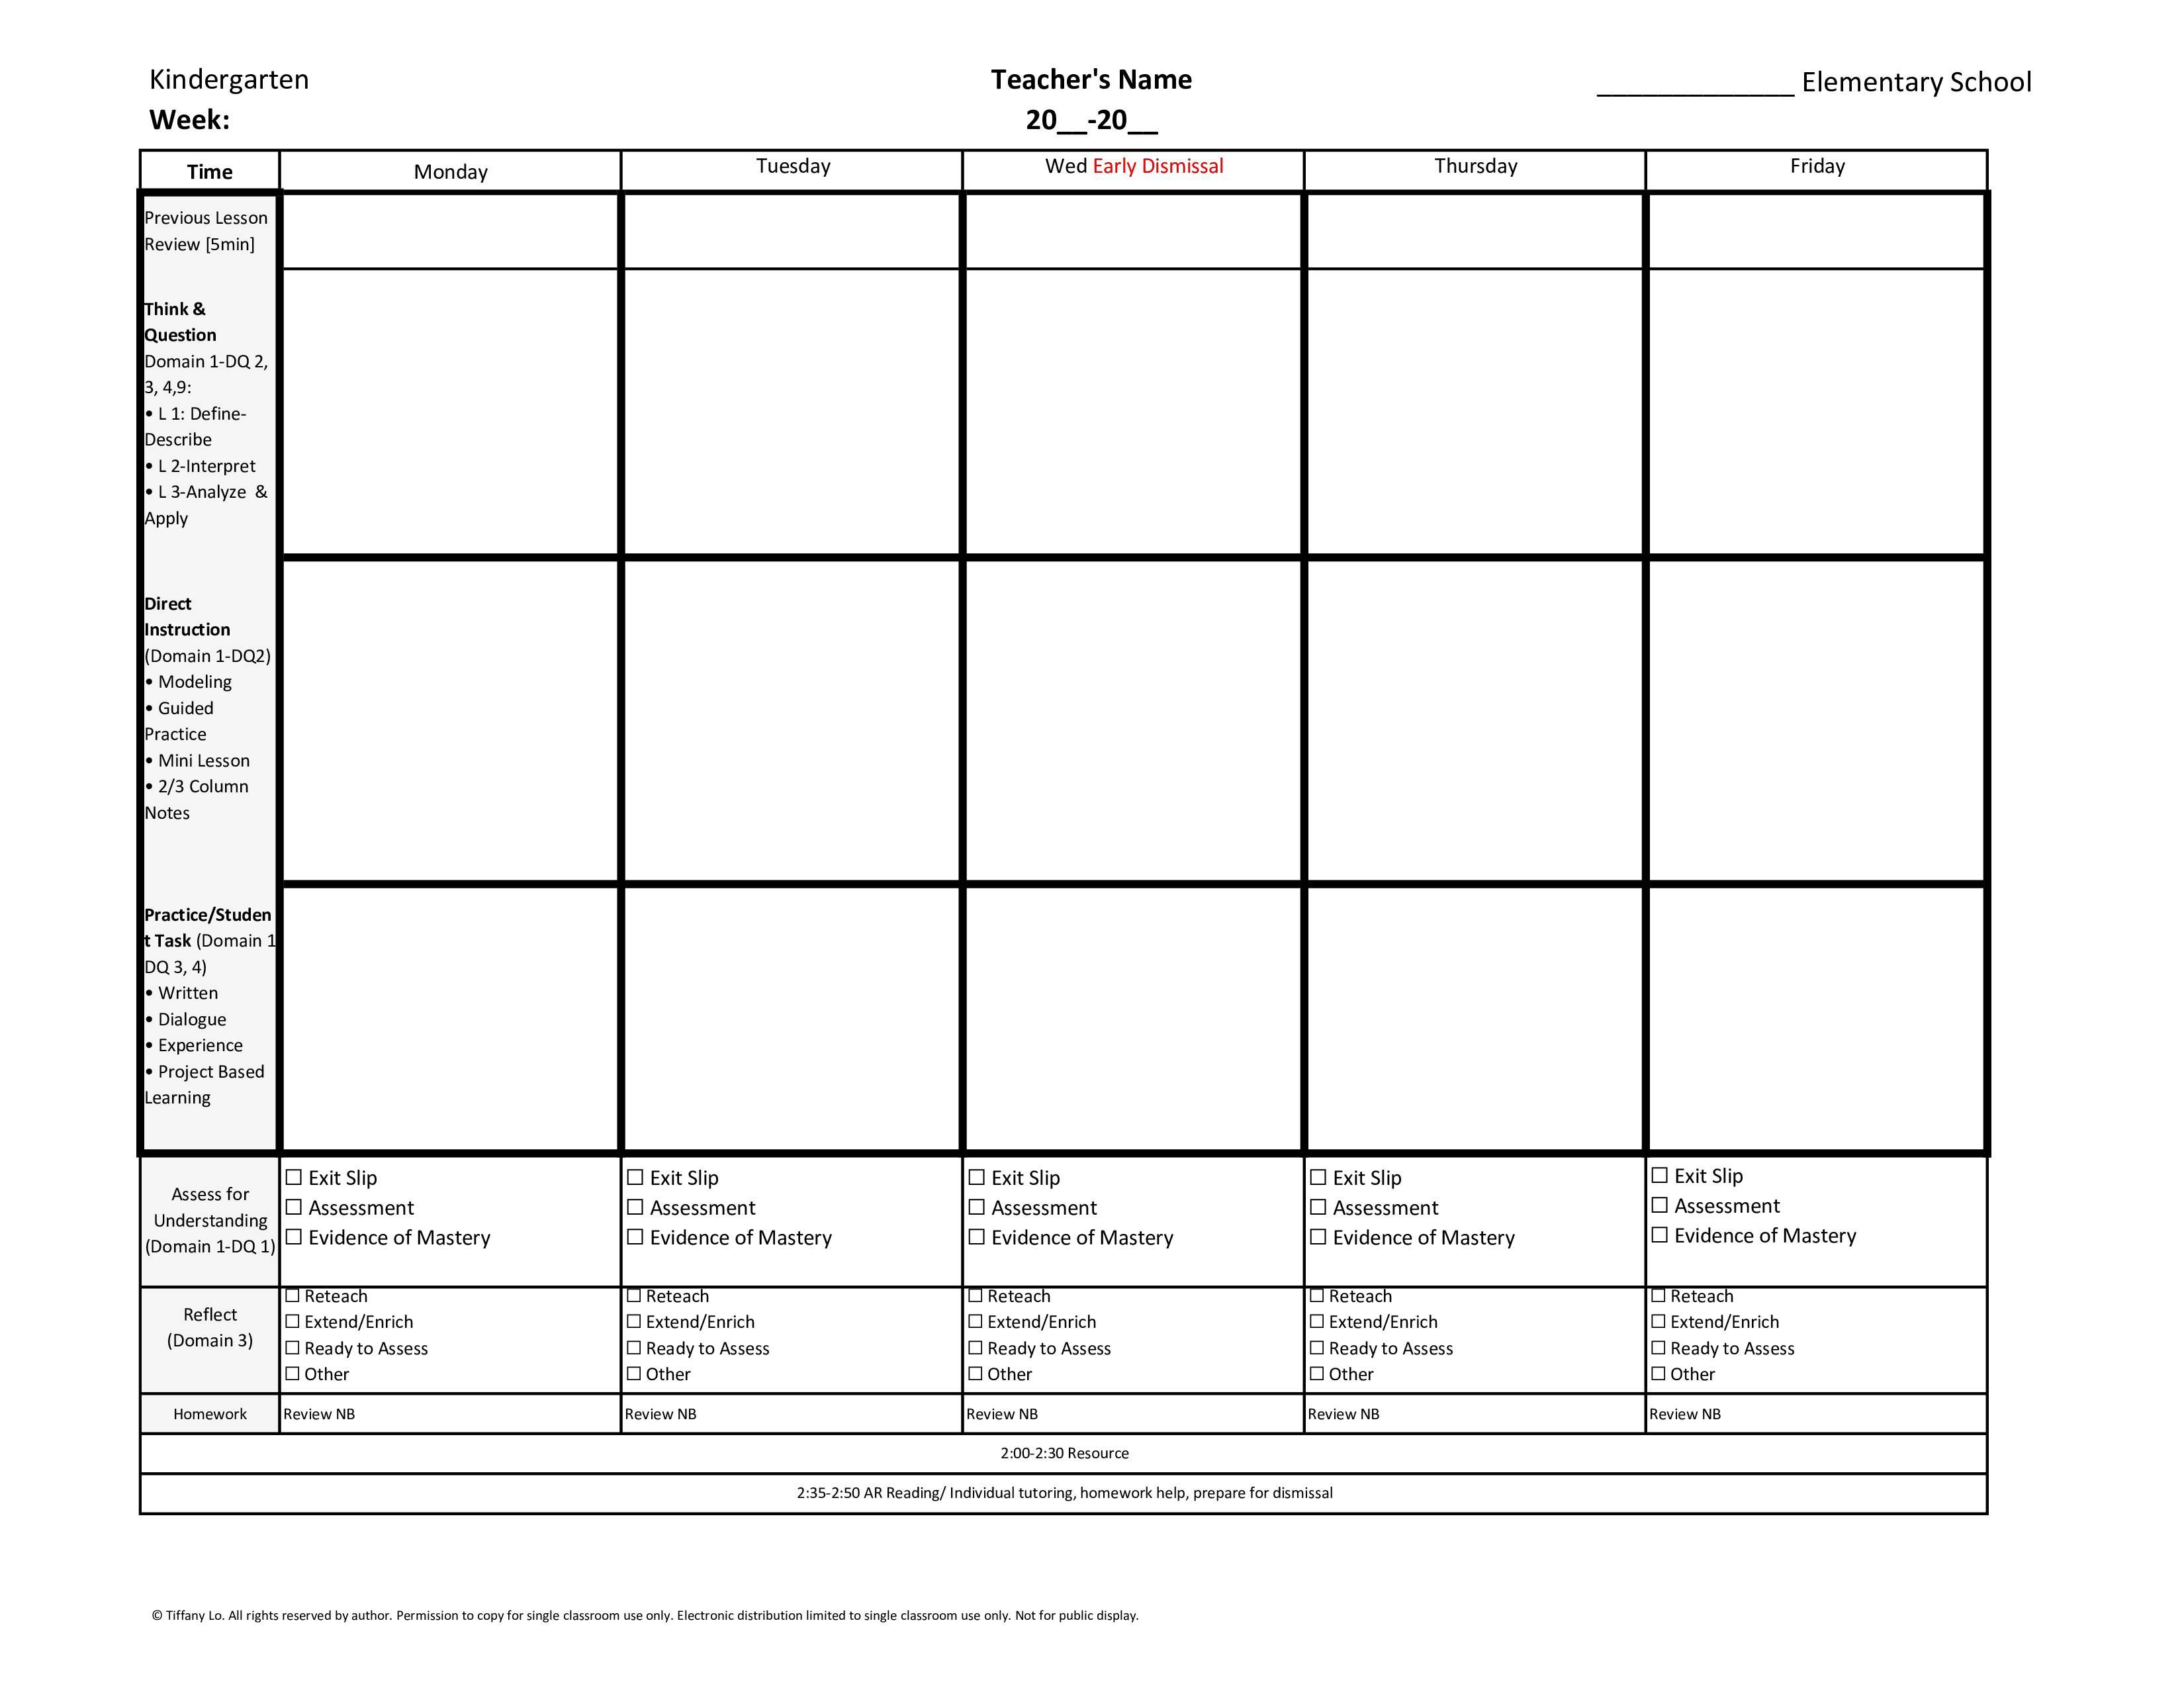 Kindergarten Weekly Lesson Plan Template W Florida